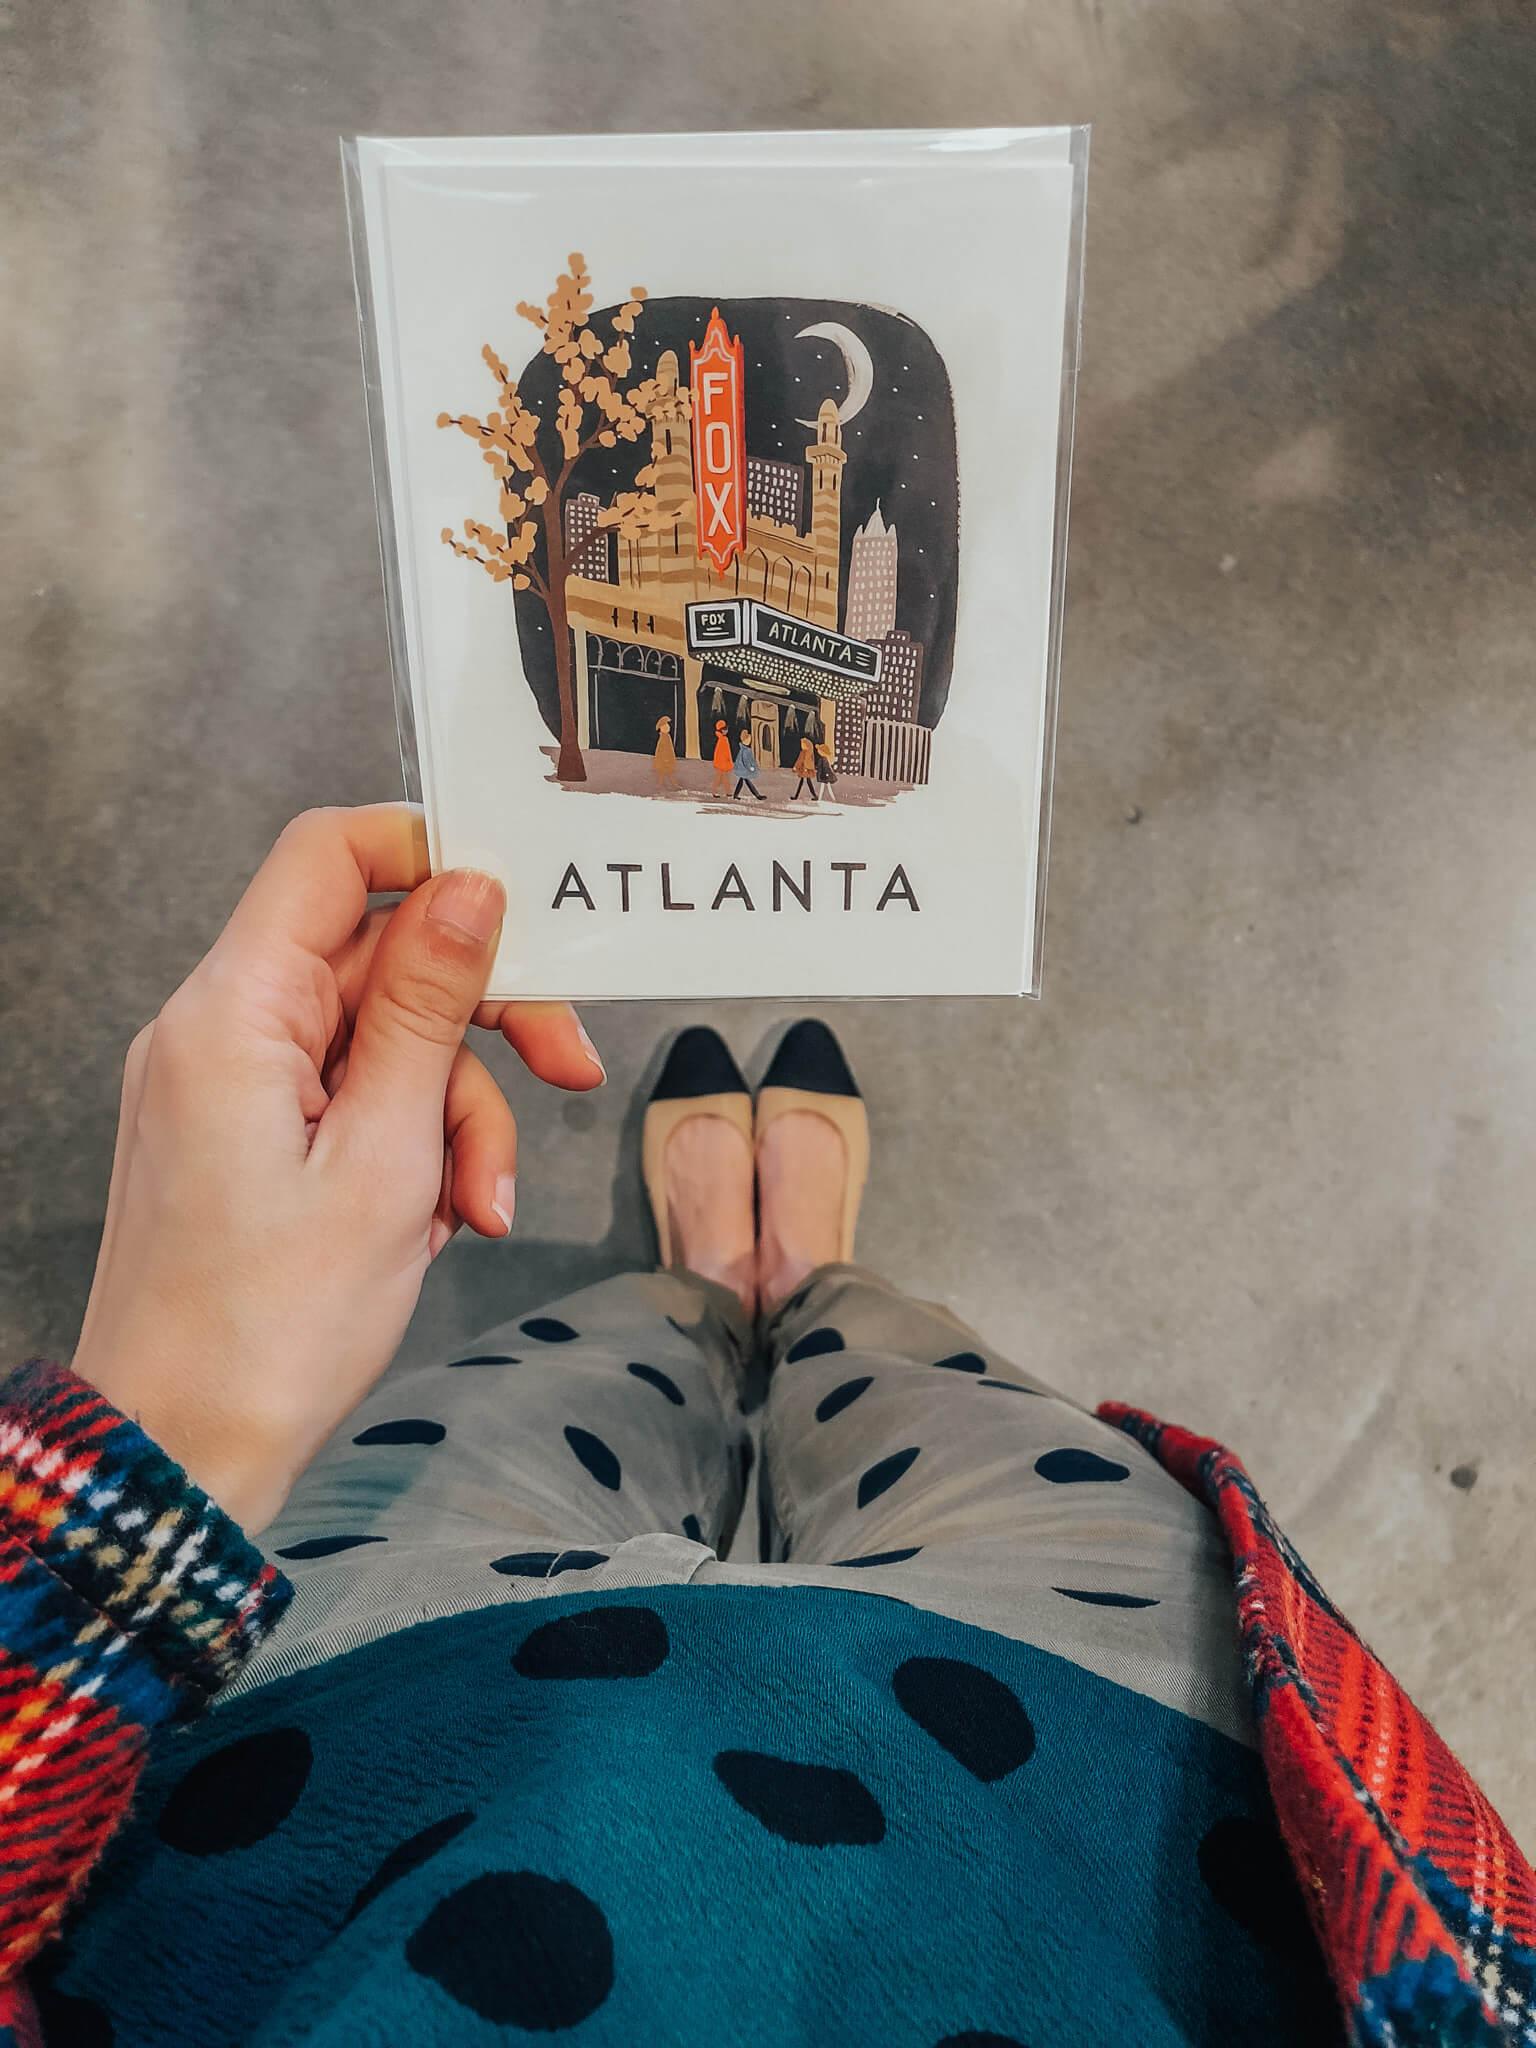 AtlantaPostcard.jpg